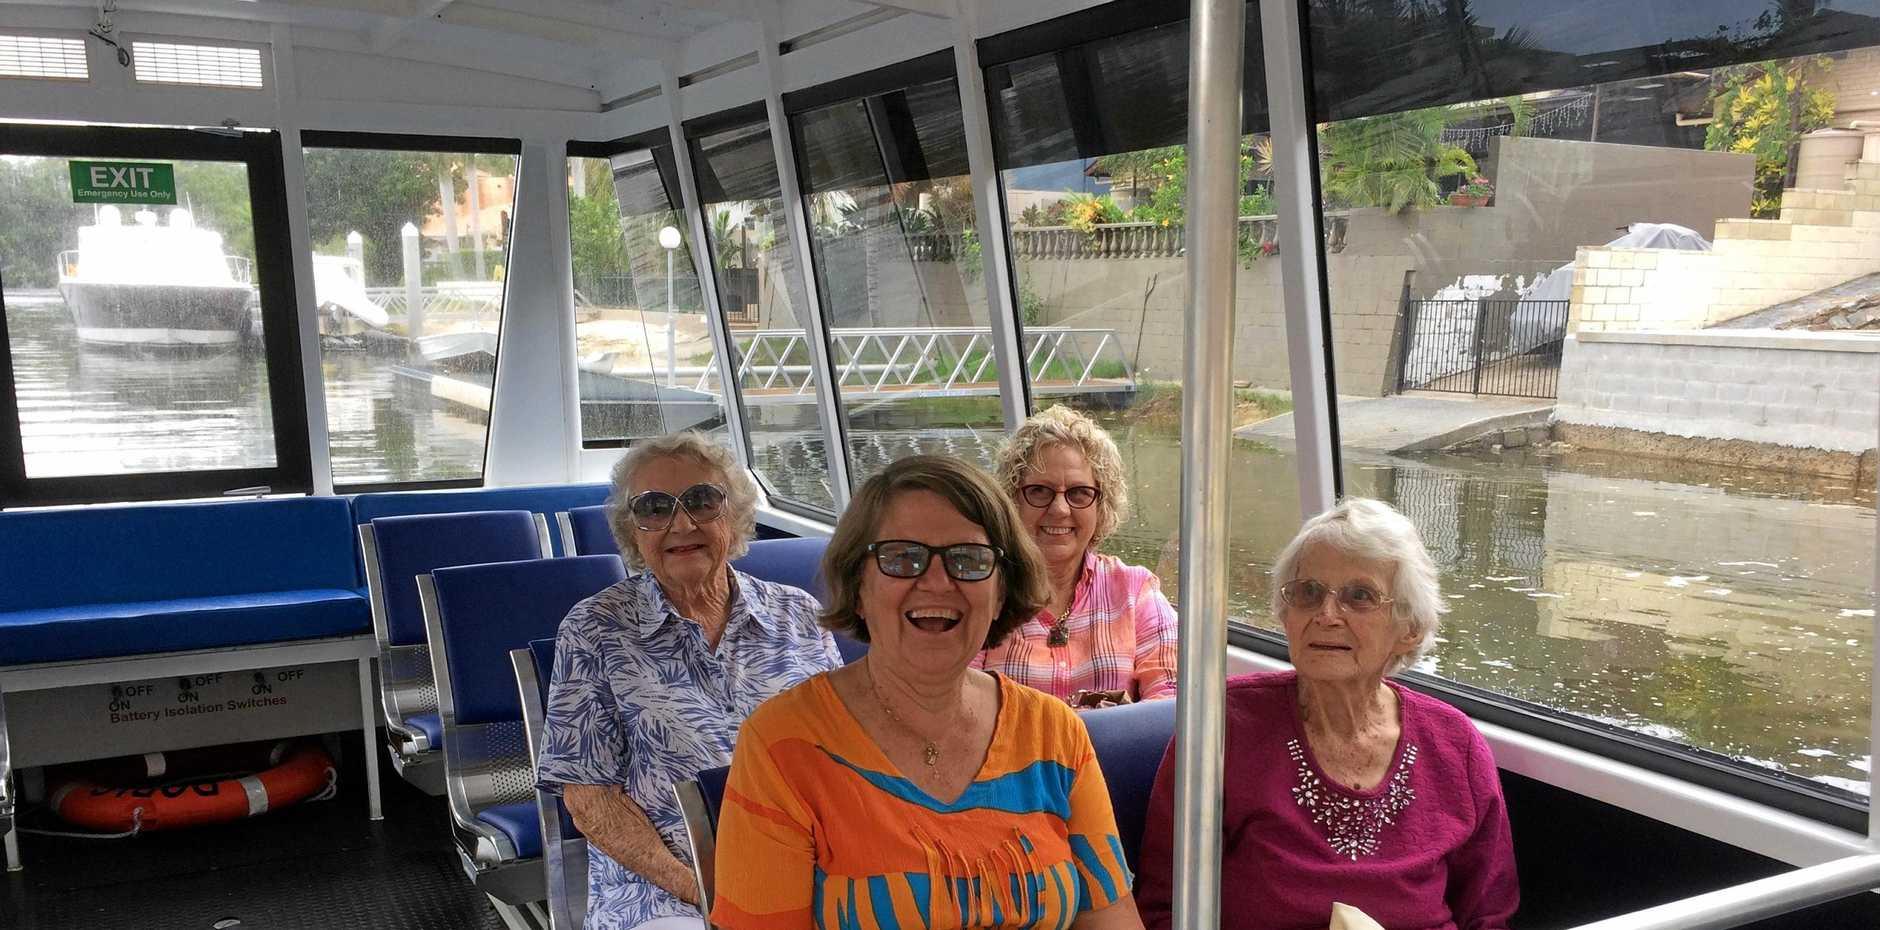 ALL ABOARD: Coral Niethe, mum Mary Mogenson, Doris Bergin and Joan Clarke enjoy seeing a new side of the Gold Coast aboard Doris.